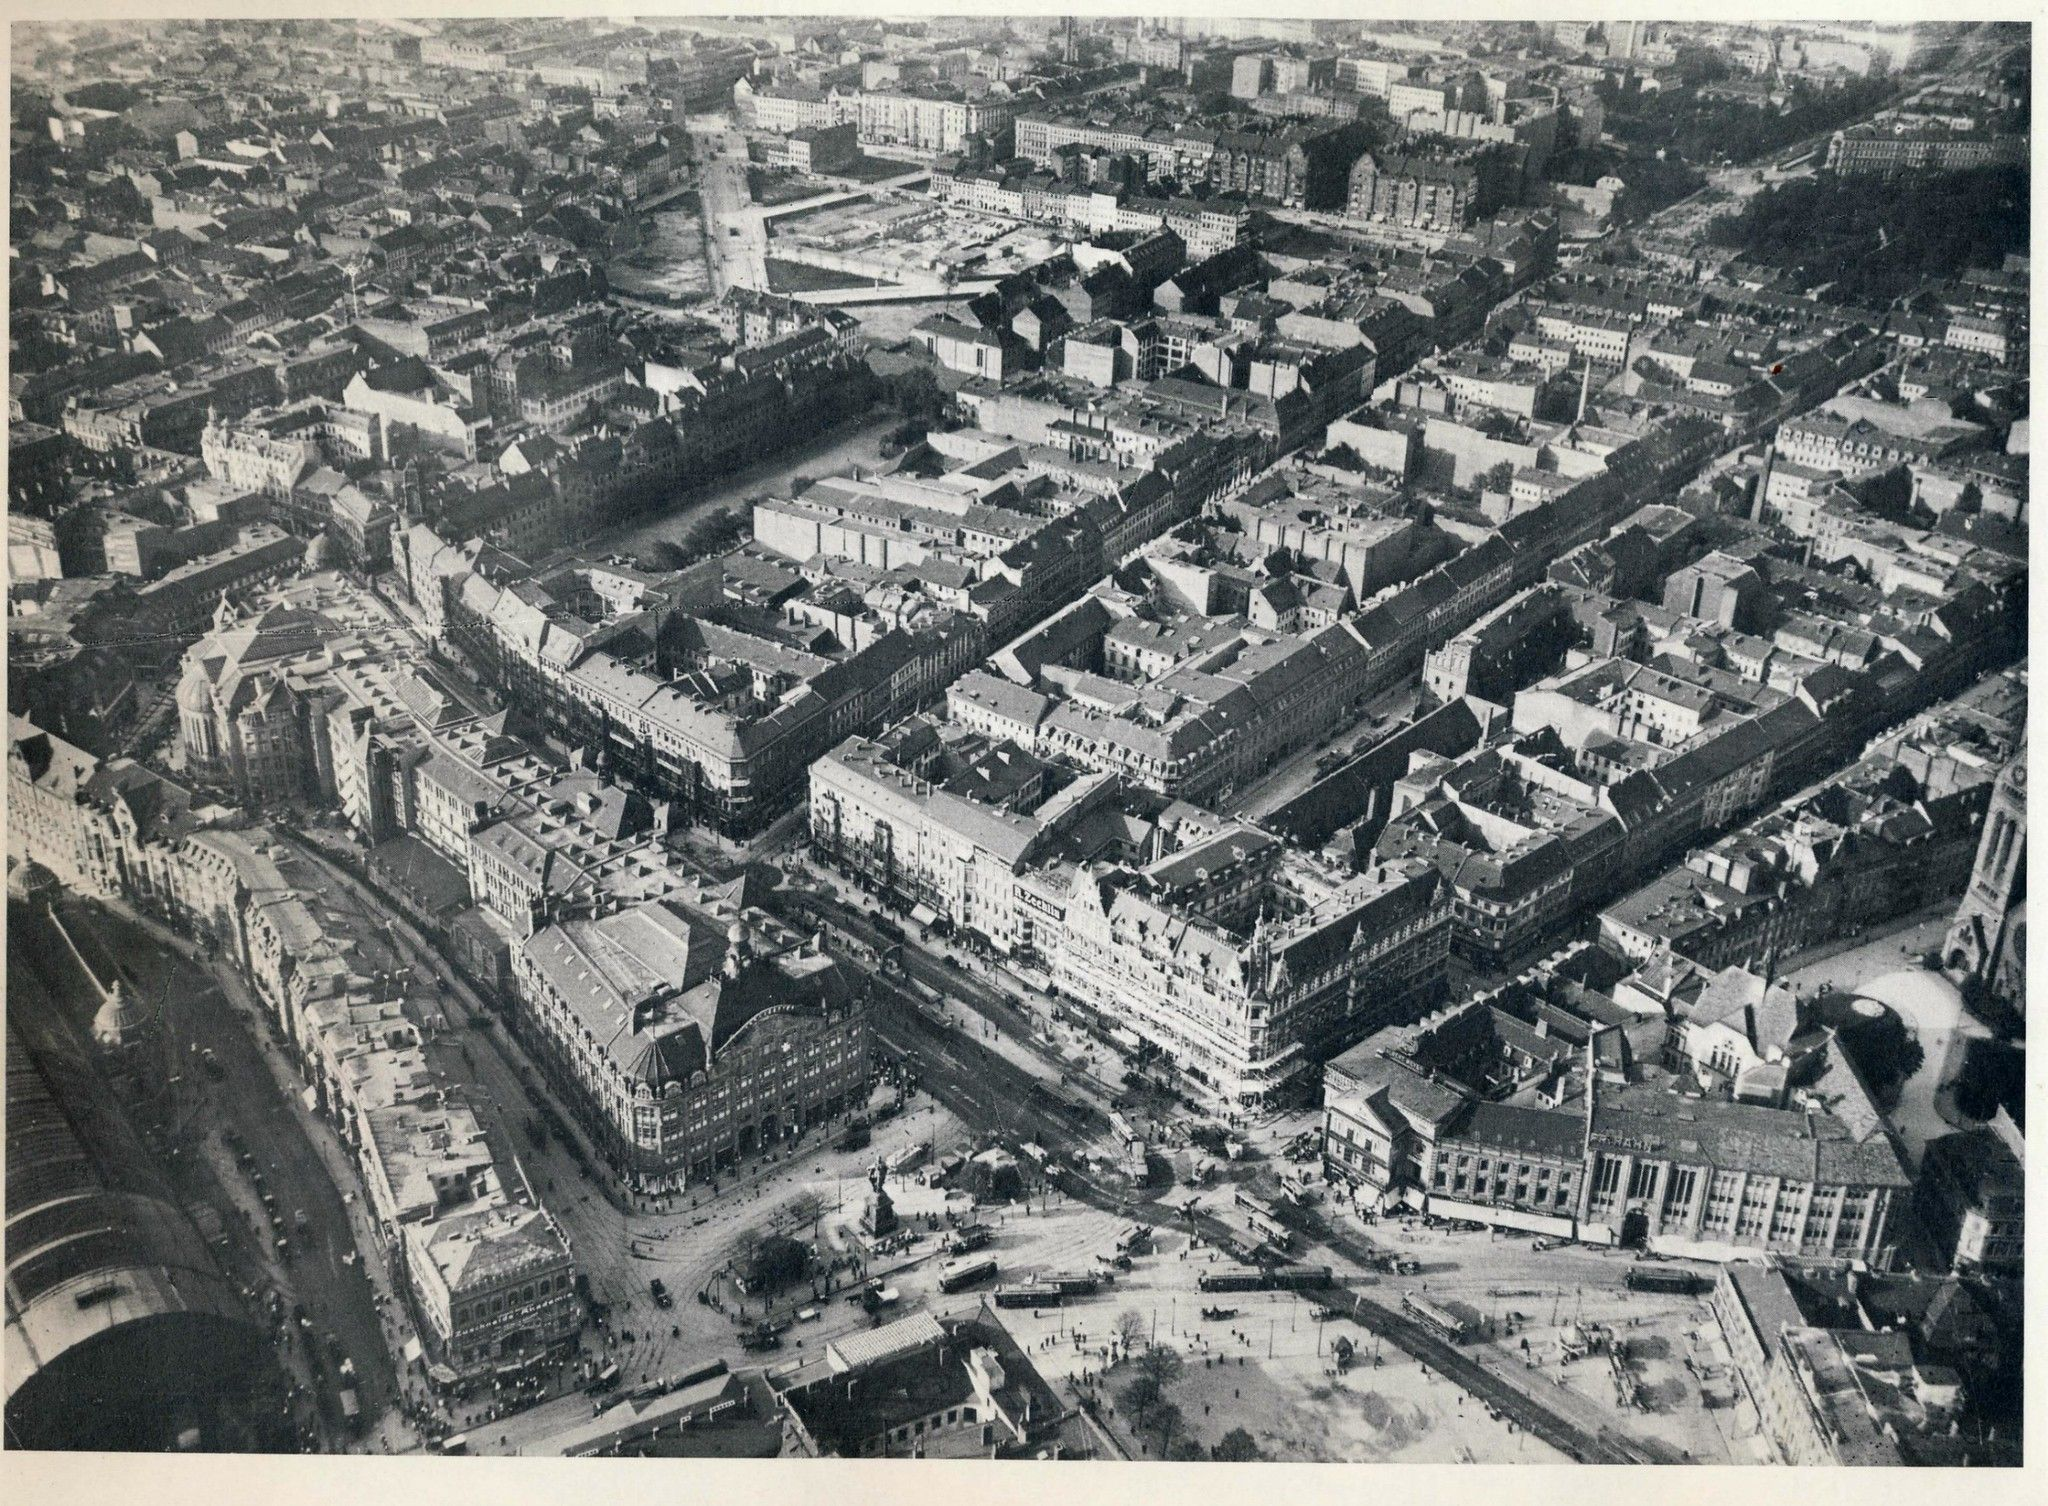 Historische Luftaufnahmen Berlin Alexanderplatz 1913 Berlin Berlin Germany Aerial Photograph